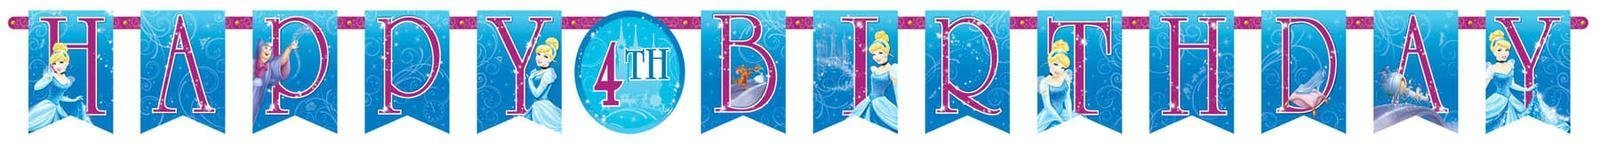 Amscan Disney Cinderella Customizable Birthday Party Banner Decoration (1 Piece), Blue, 10 1/2' x 10''. by Amscan